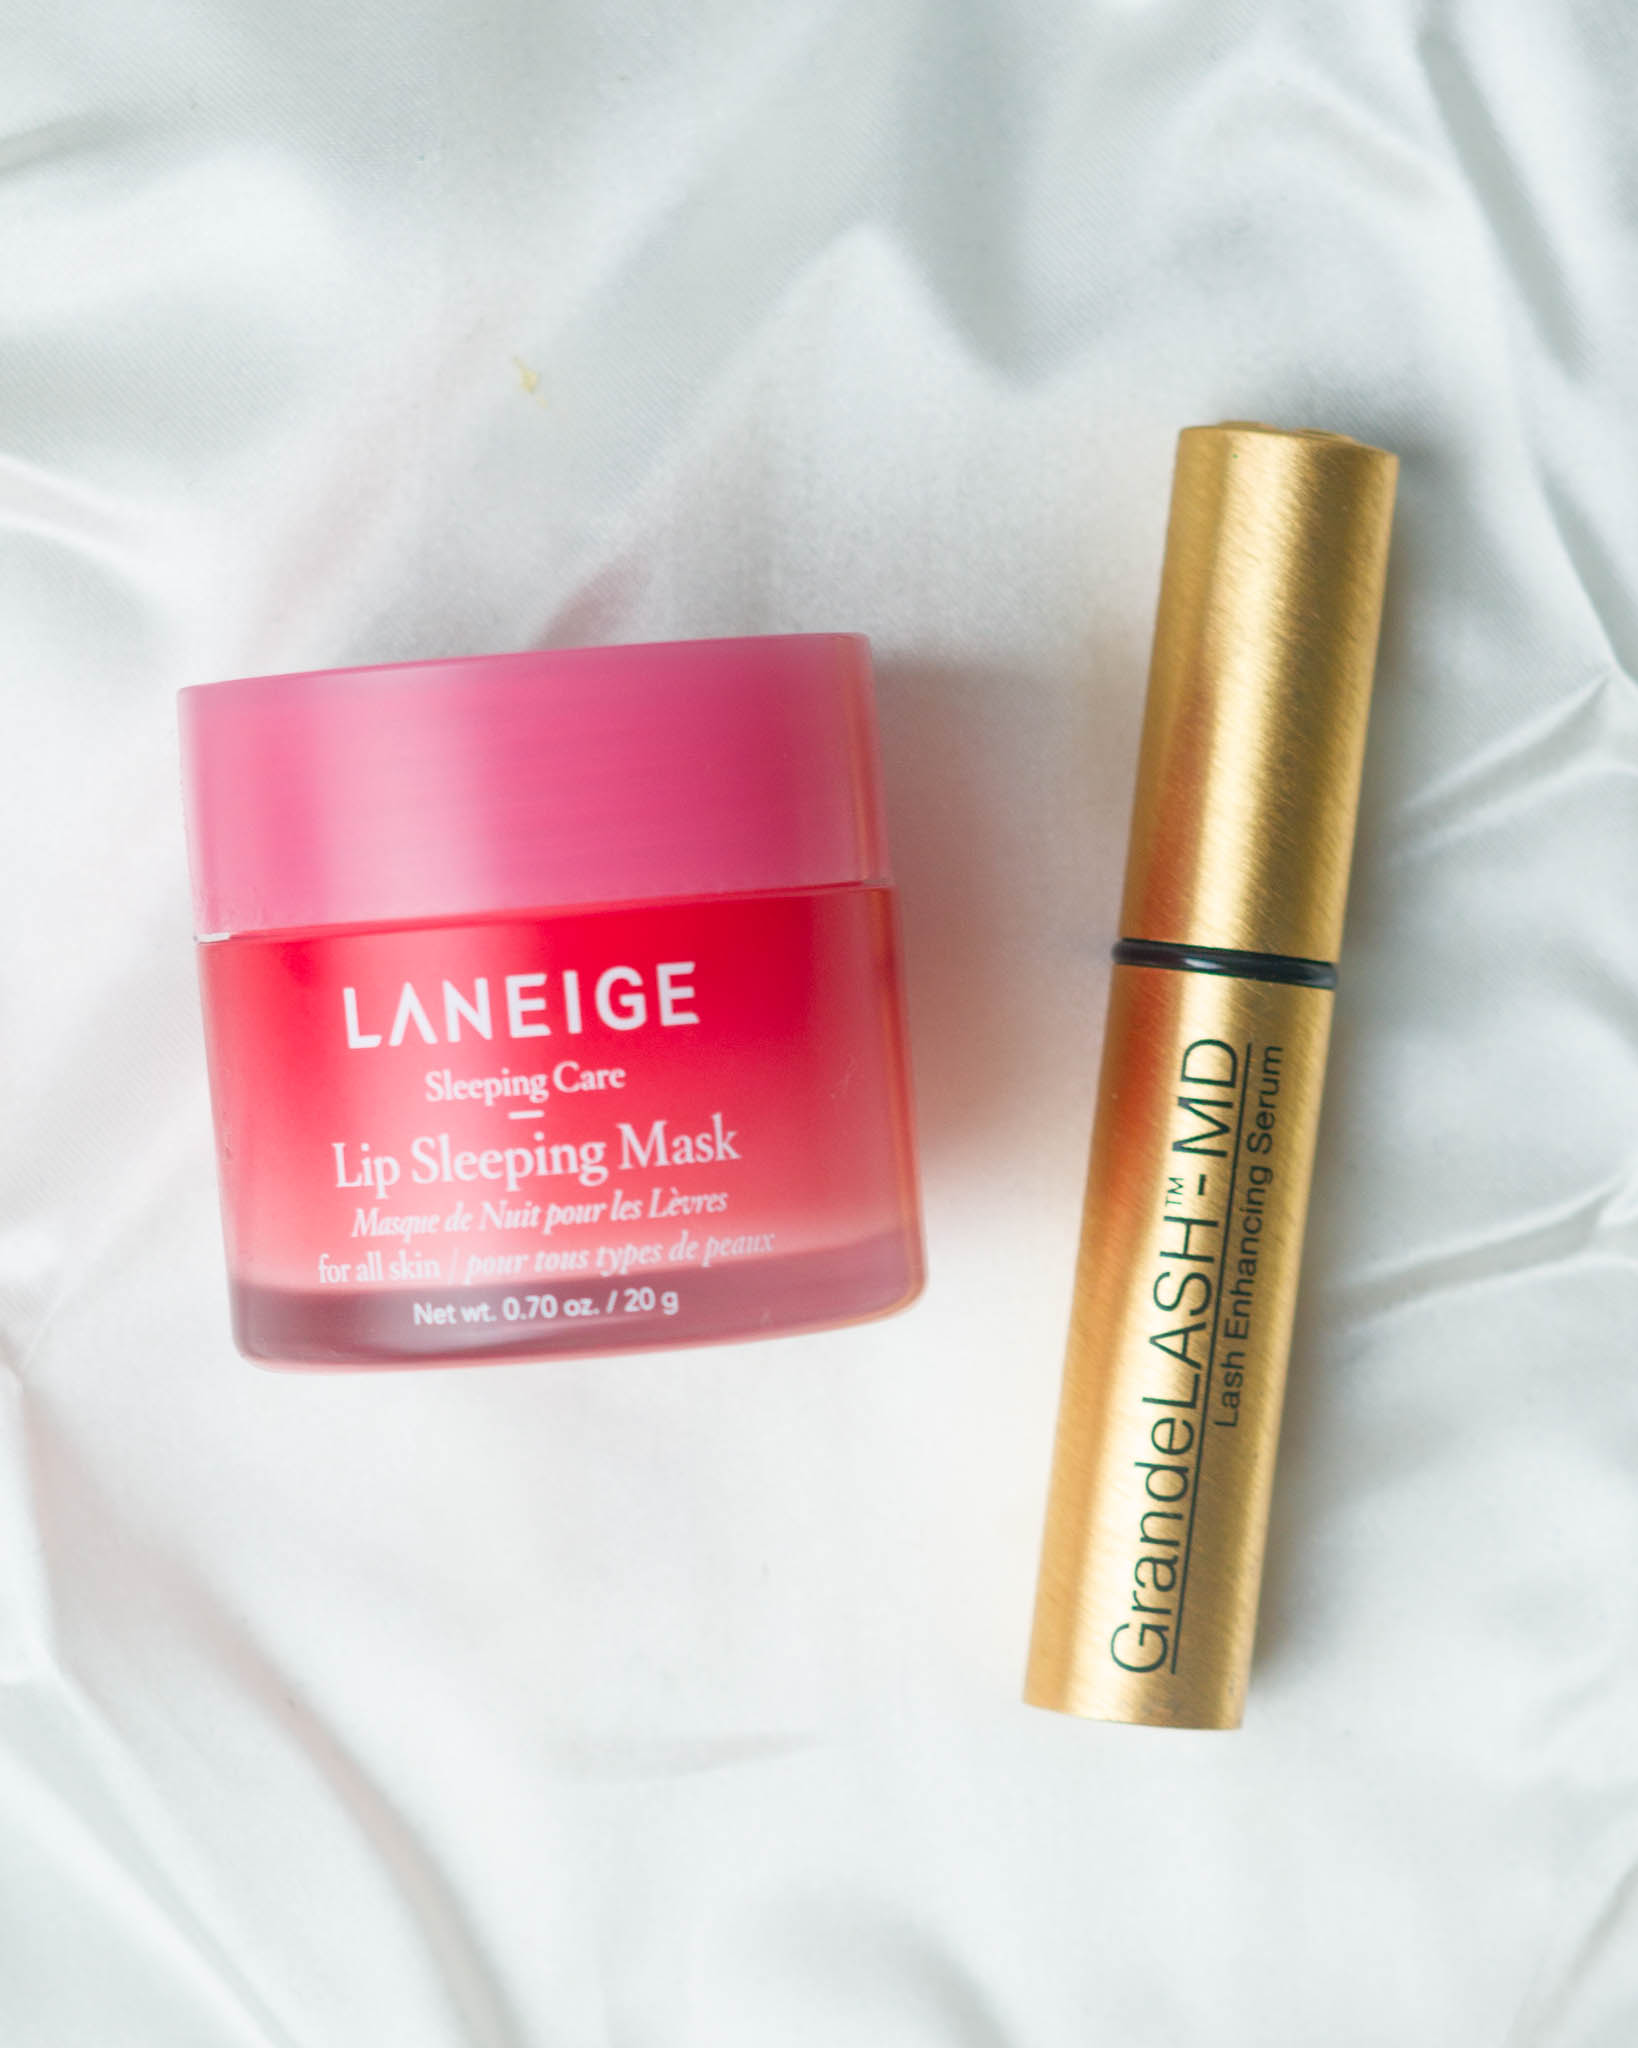 Laneige Lip Sleeping Mask and GrandeLASH Lash Enhancing Serum